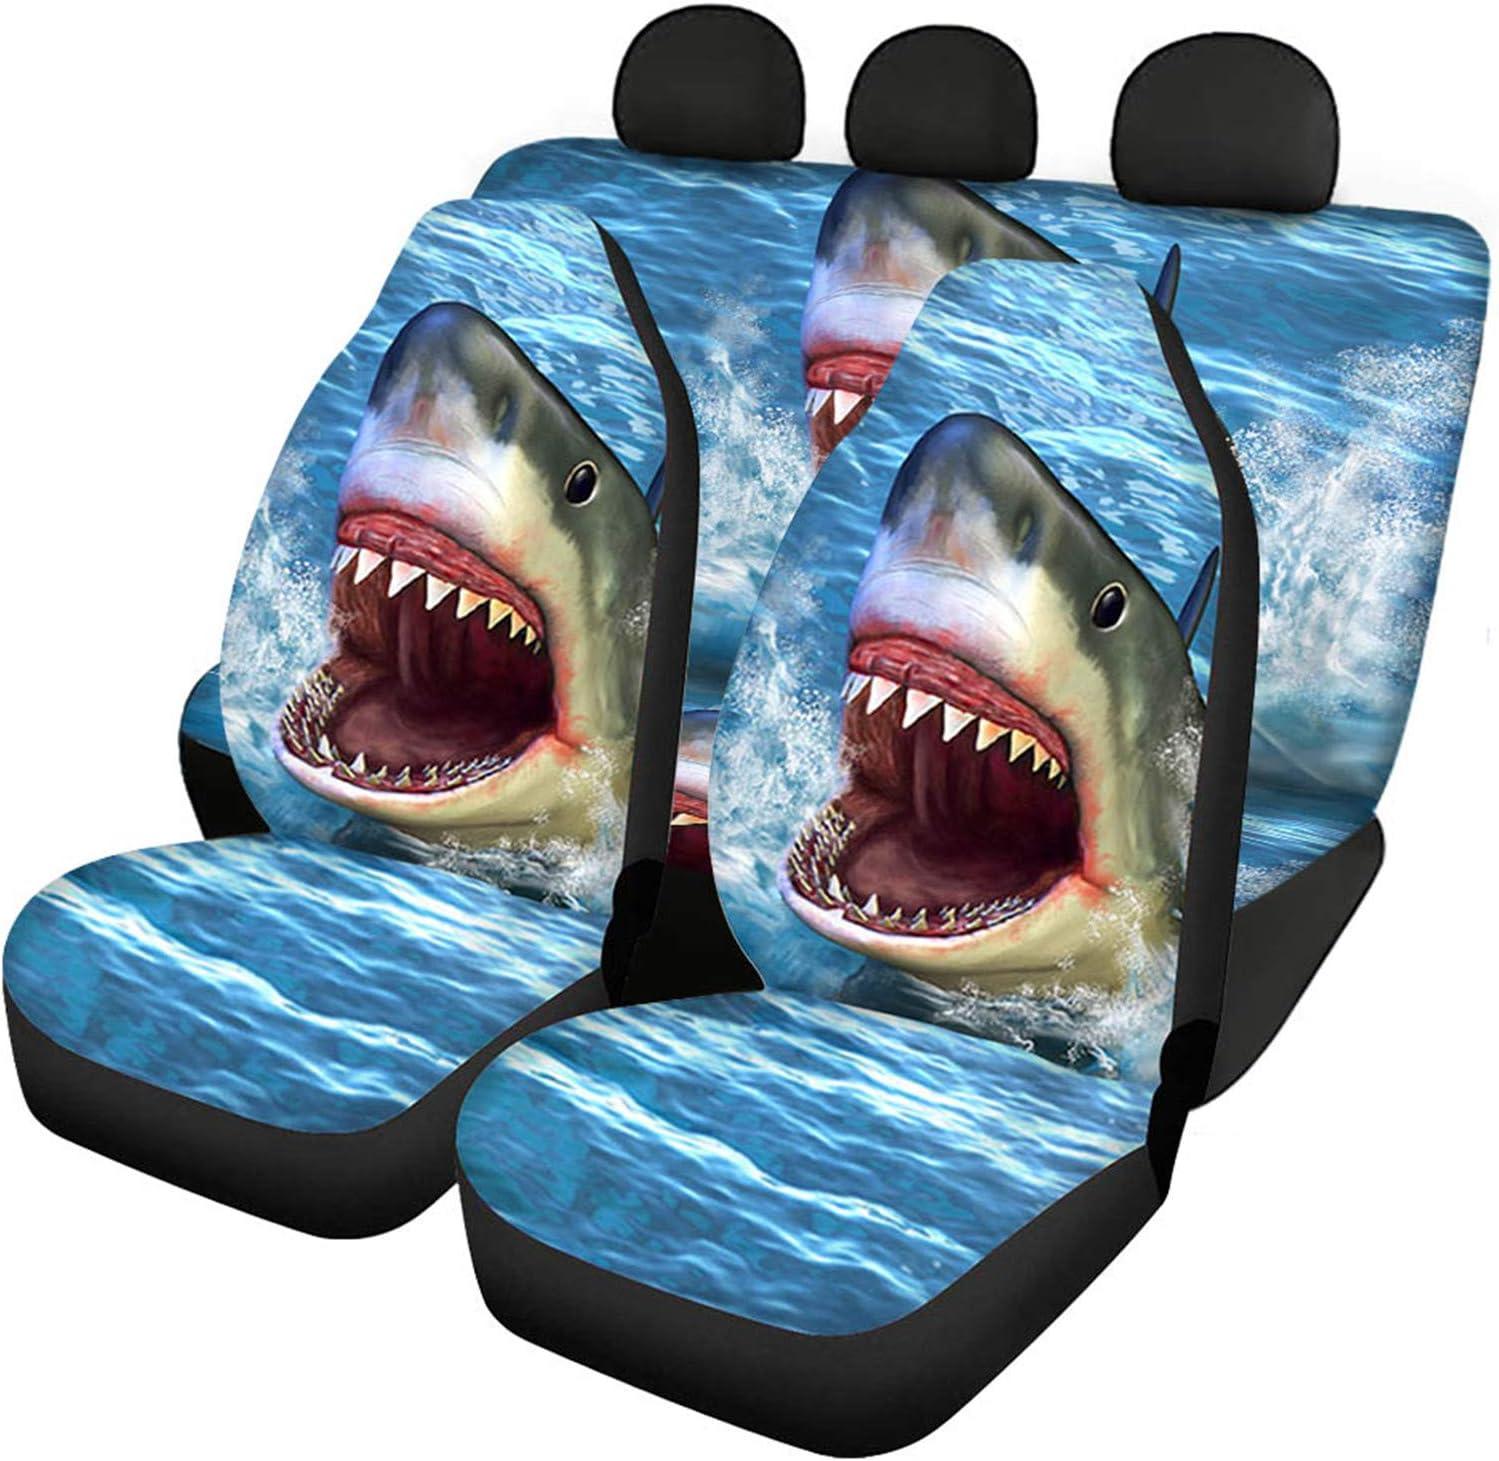 doginthehole 3 Piece Sea Sales for sale Animal Shark Car Pattern Oklahoma City Mall Covers Fu Seat